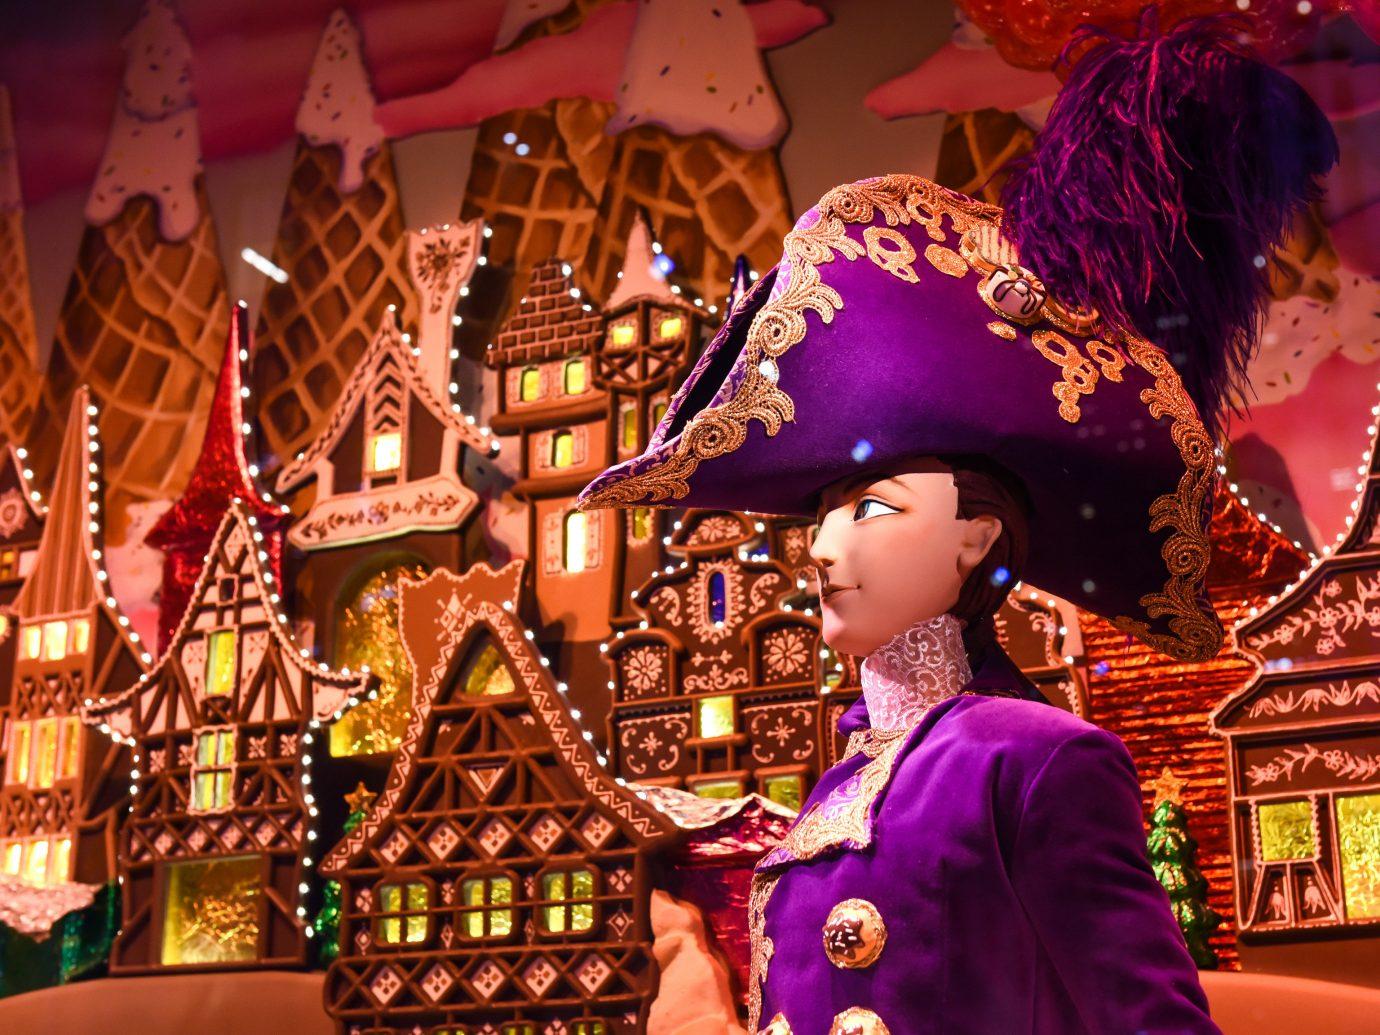 Trip Ideas person dancer musical theatre carnival amusement park festival decorated colored